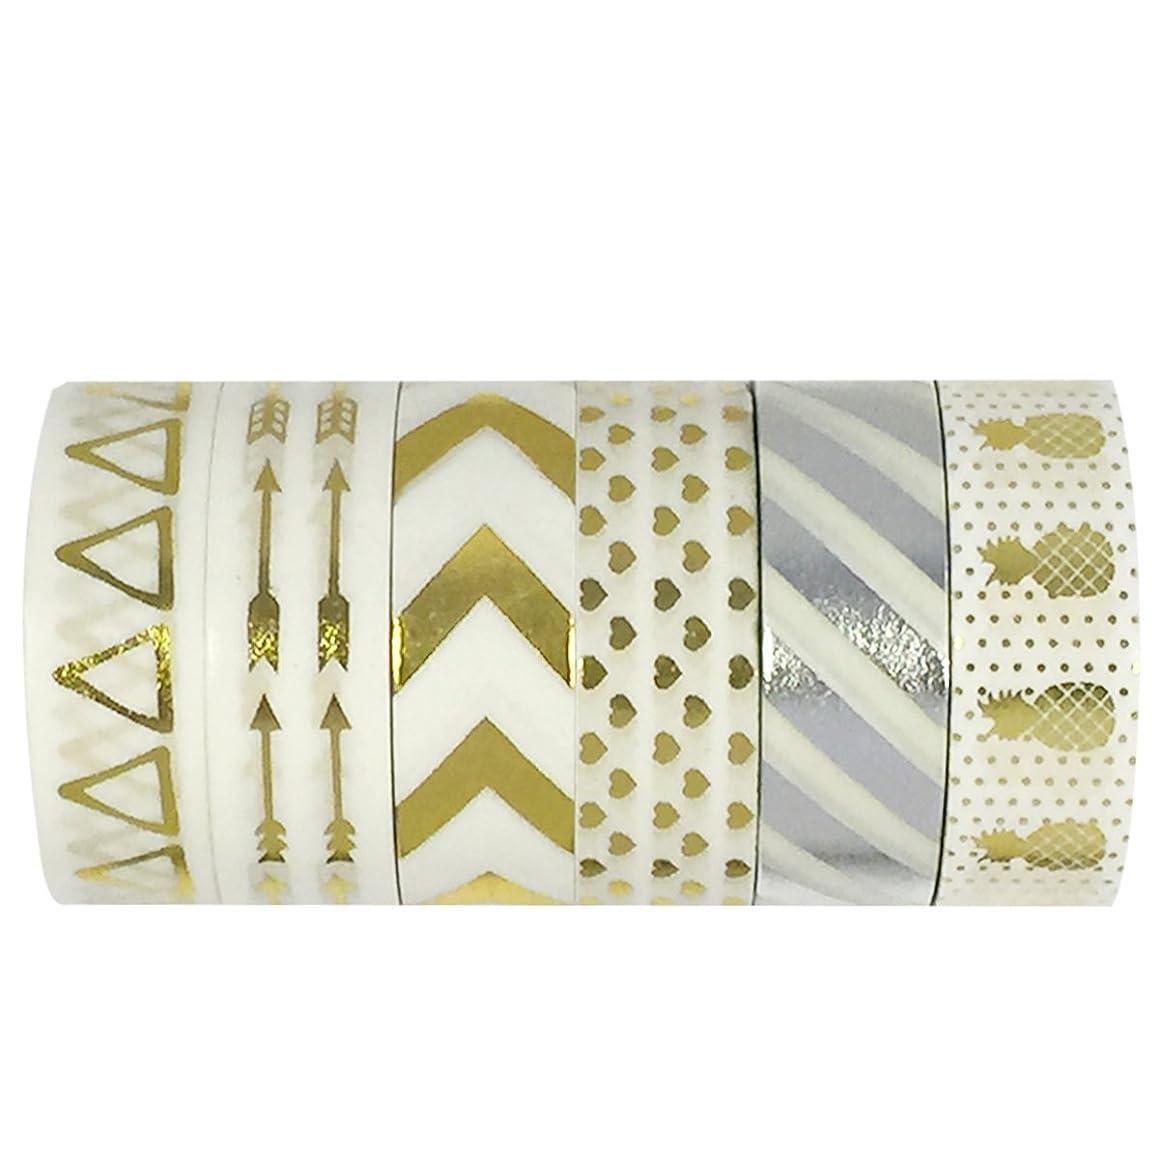 Allydrew Washi Tapes Decorative Masking Tapes, Set of 6, AD96